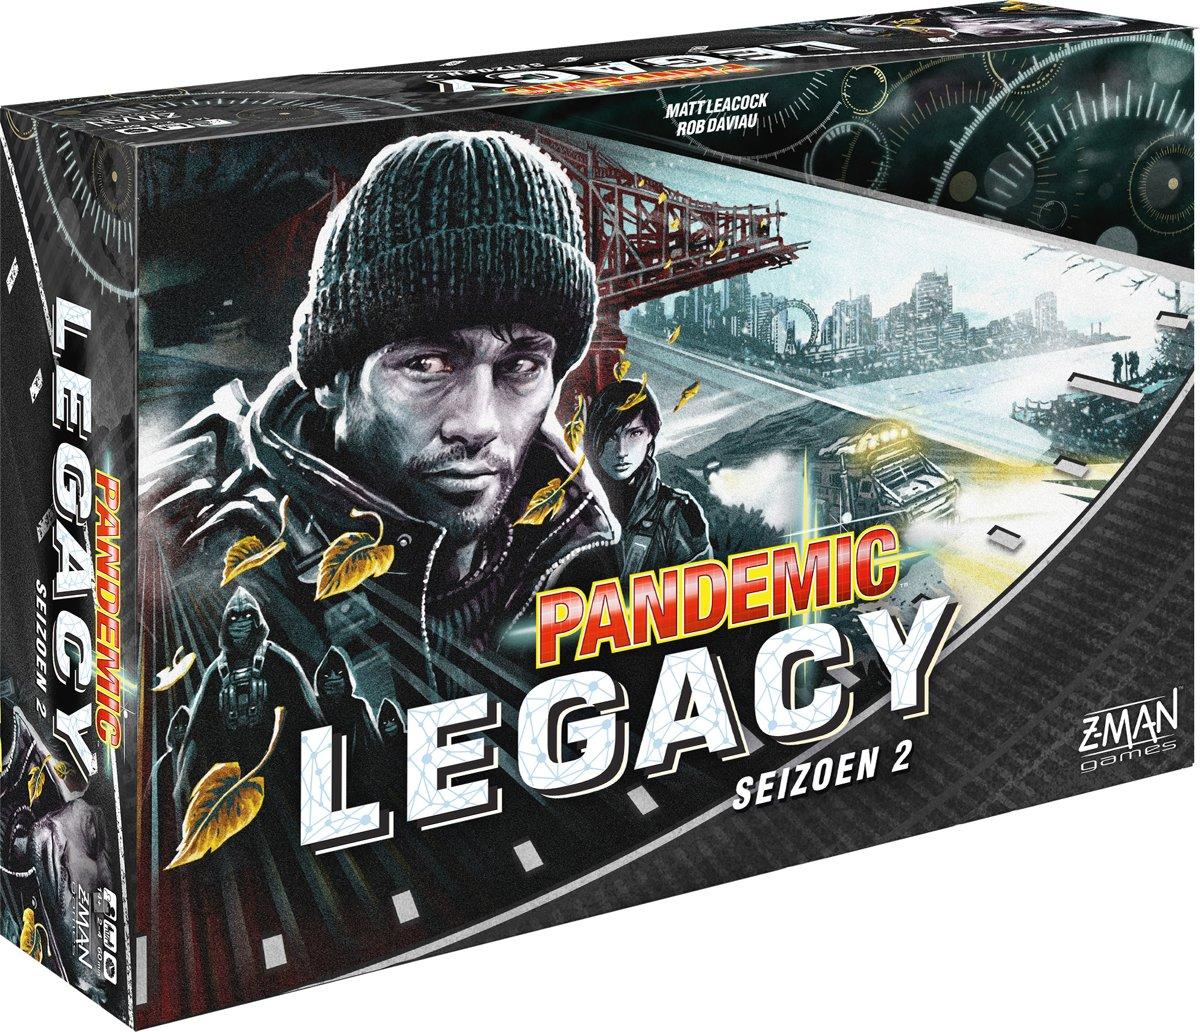 Pandemic Legacy Seizoen 2 Black - Bordspel